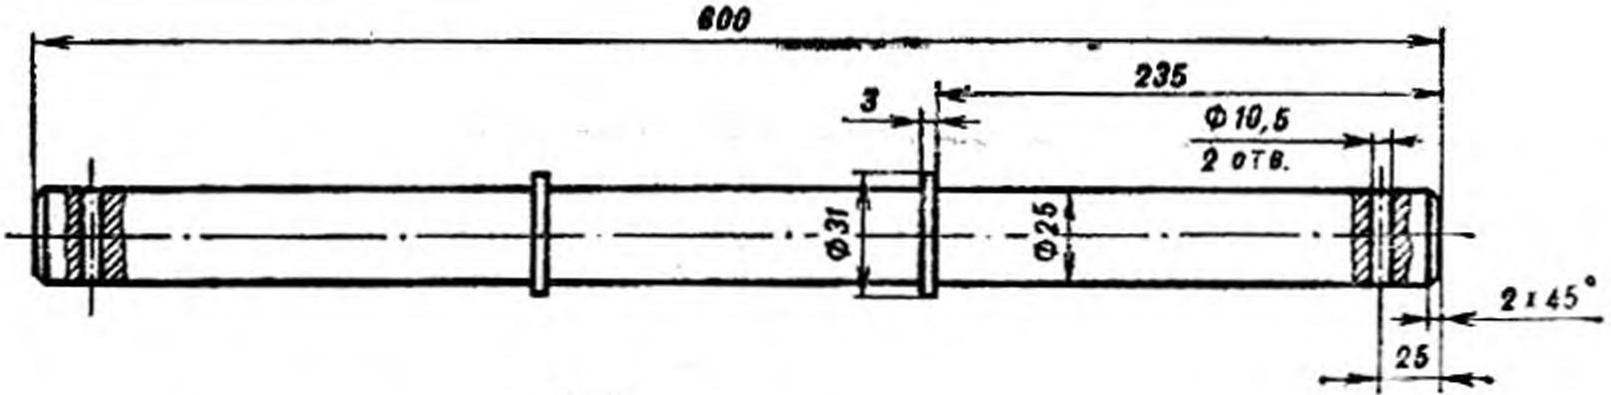 Р и с. 4. Ходовой вал